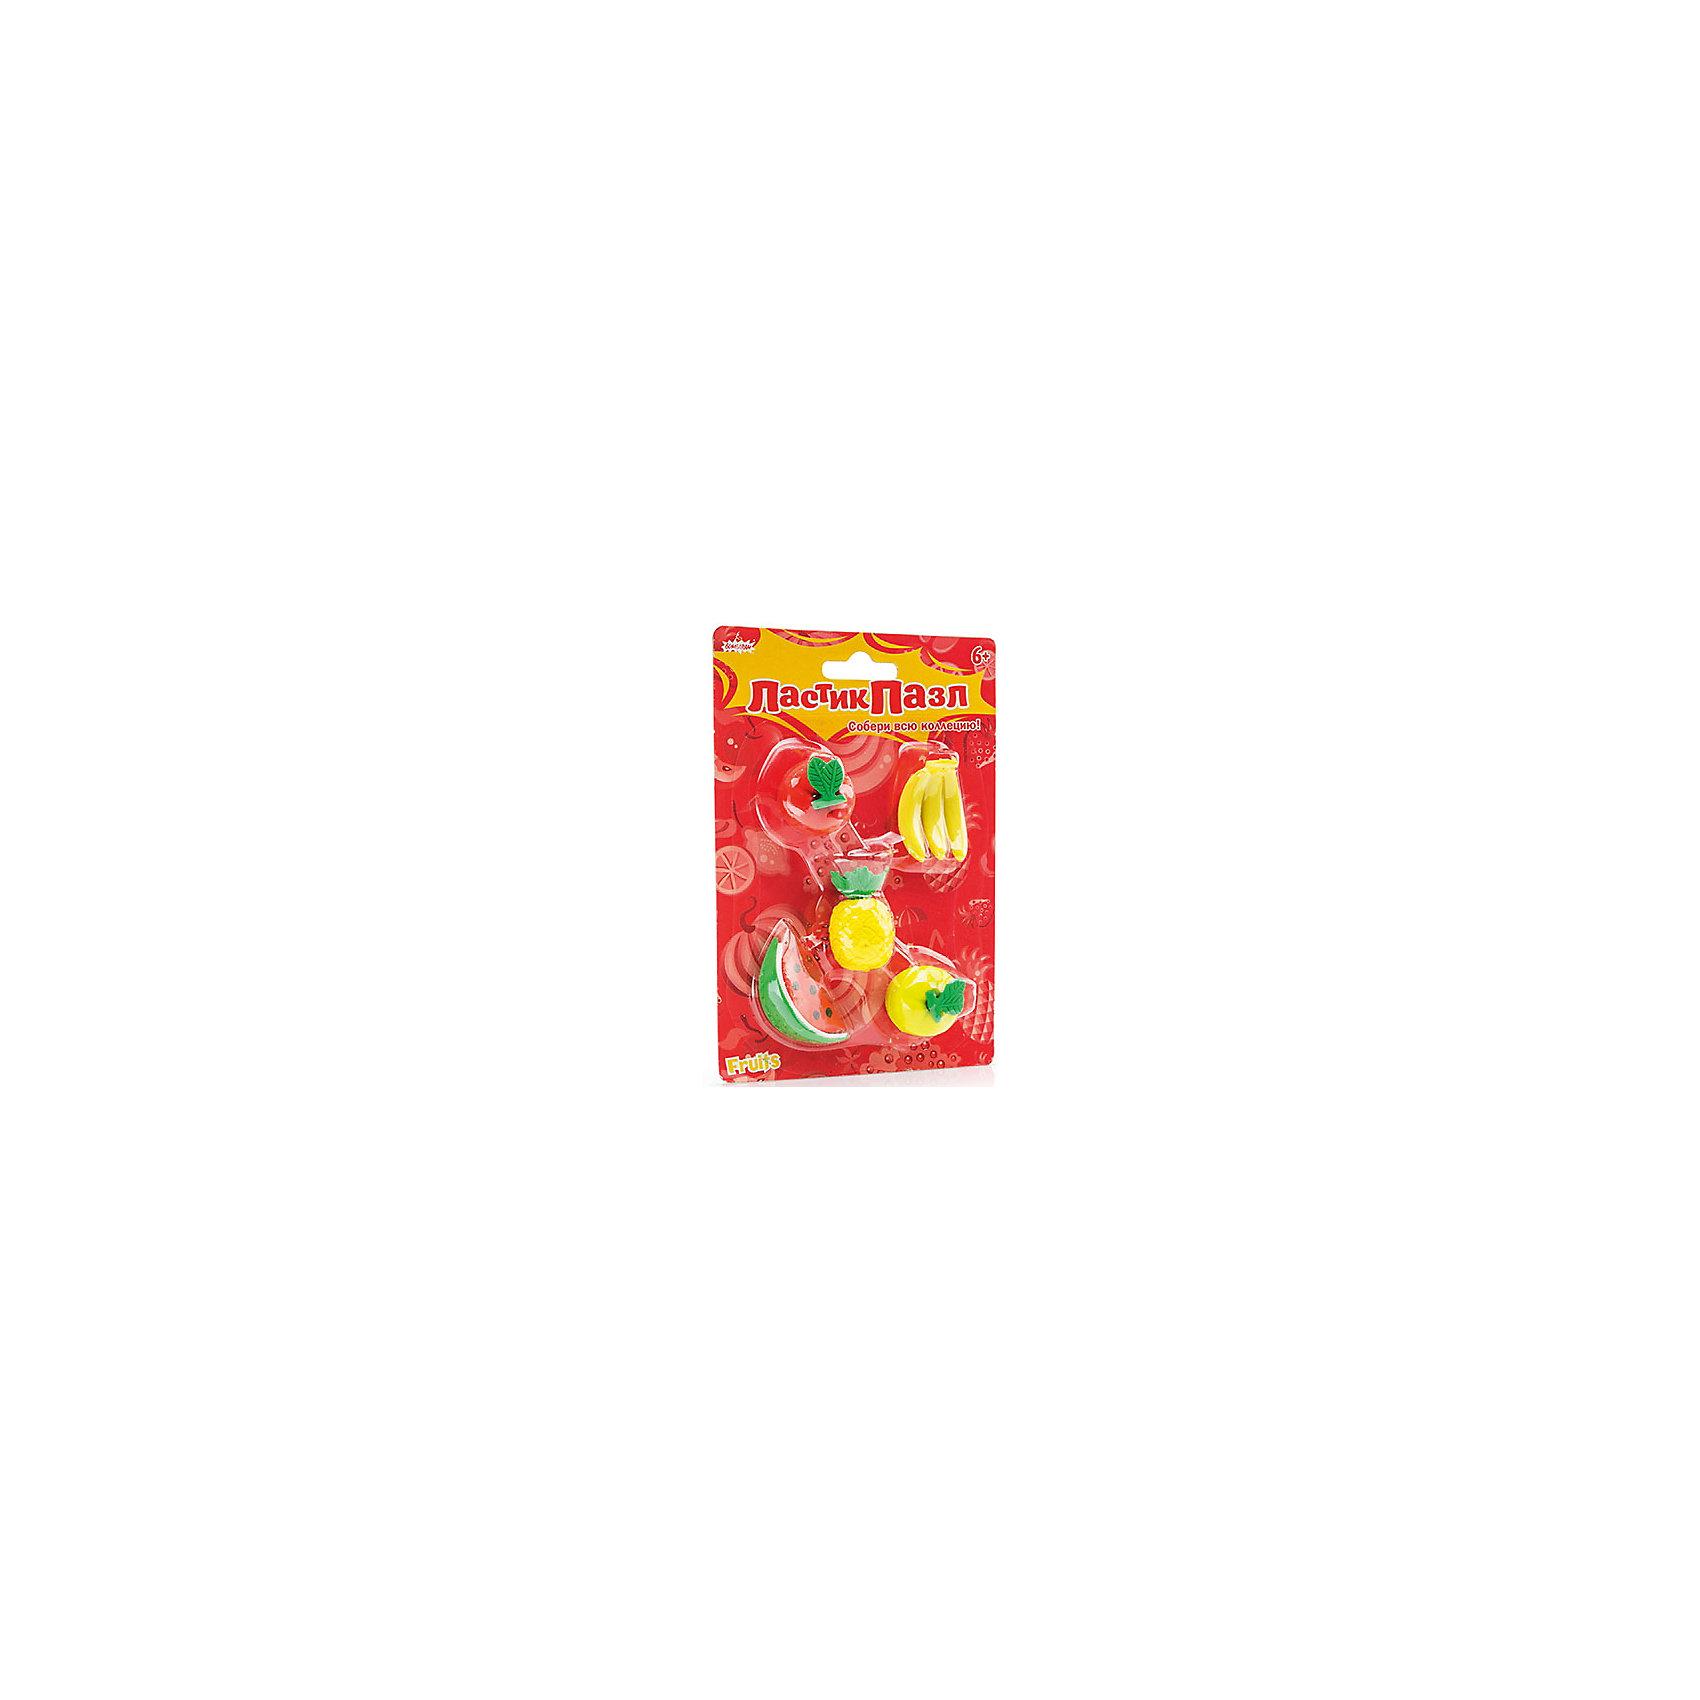 Бумбарам Набор Ластик-пазл - Фруктовое ассорти Бумбарам бумбарам набор ластиков пазлов закуски бумбарам